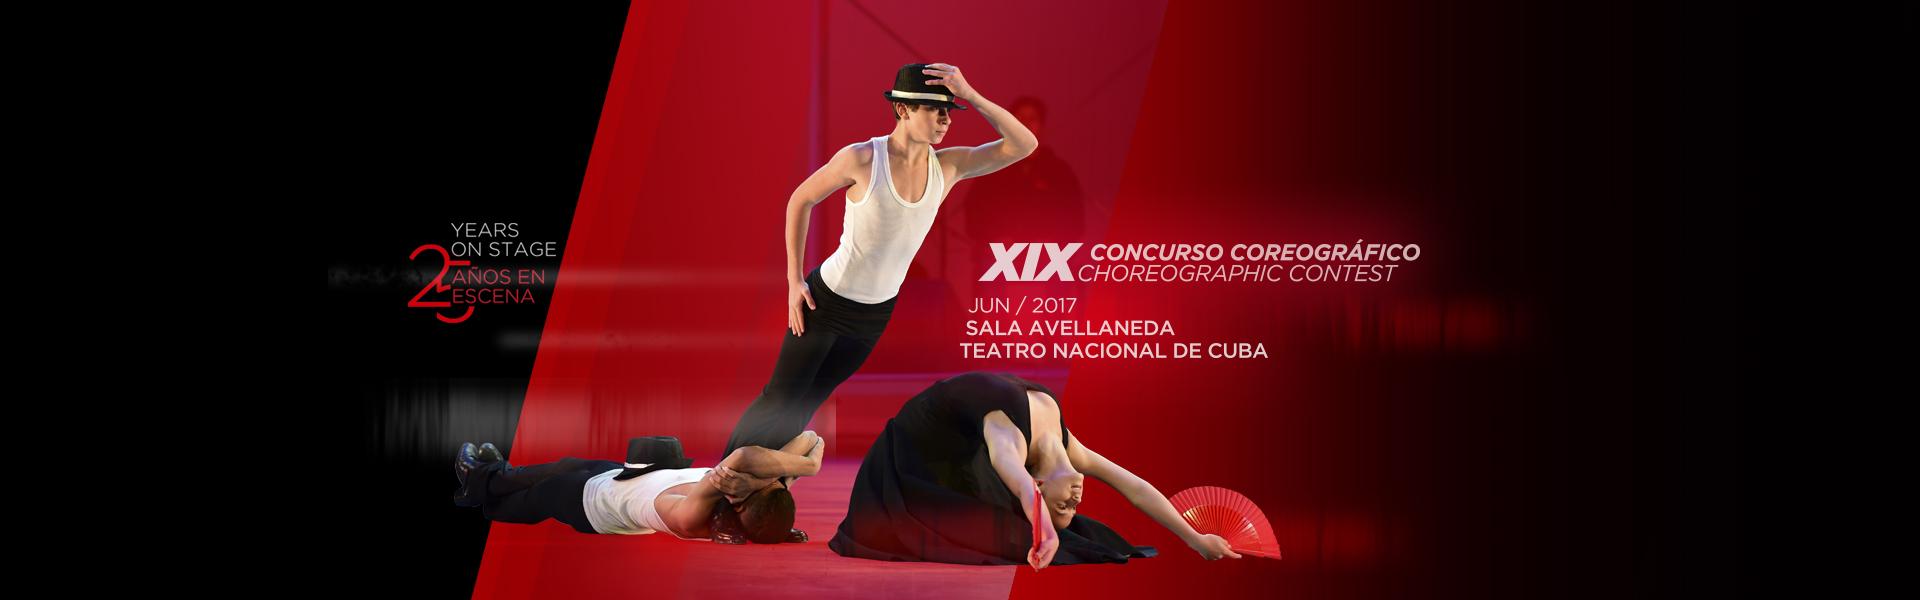 BANER-concurso-coreografico